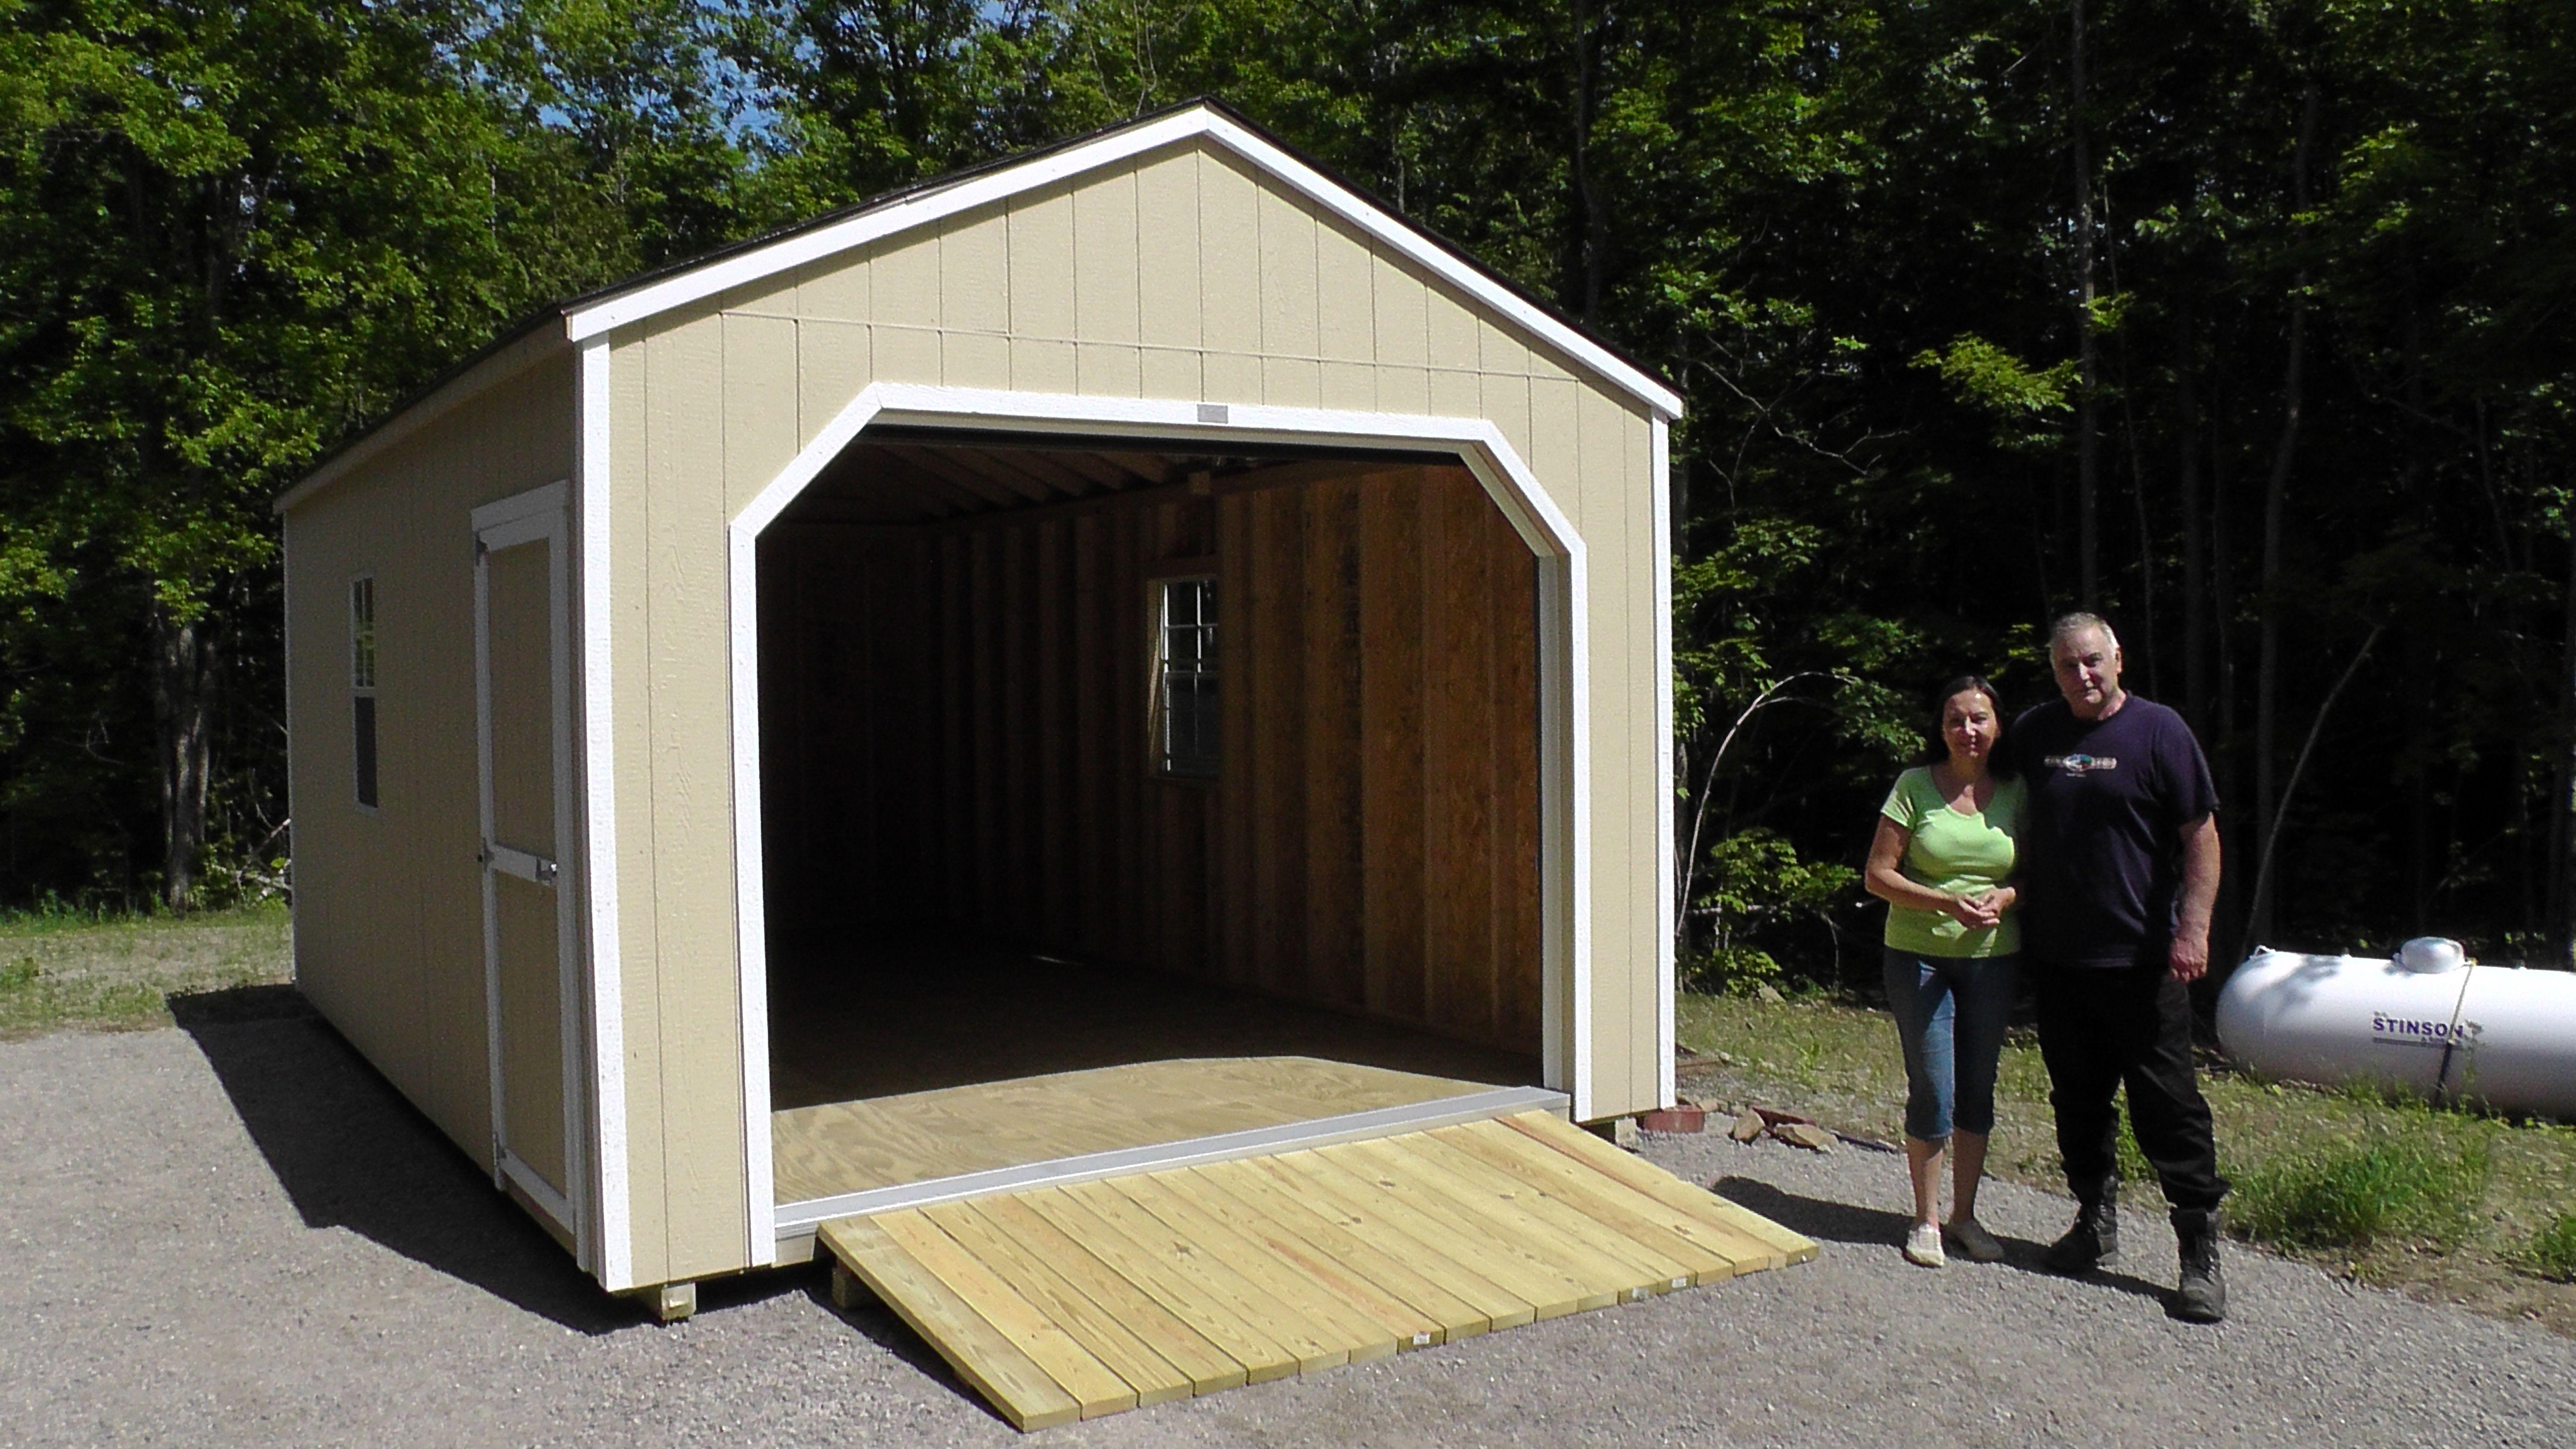 12' X 24' Portable Garage delivered near near Merrickville